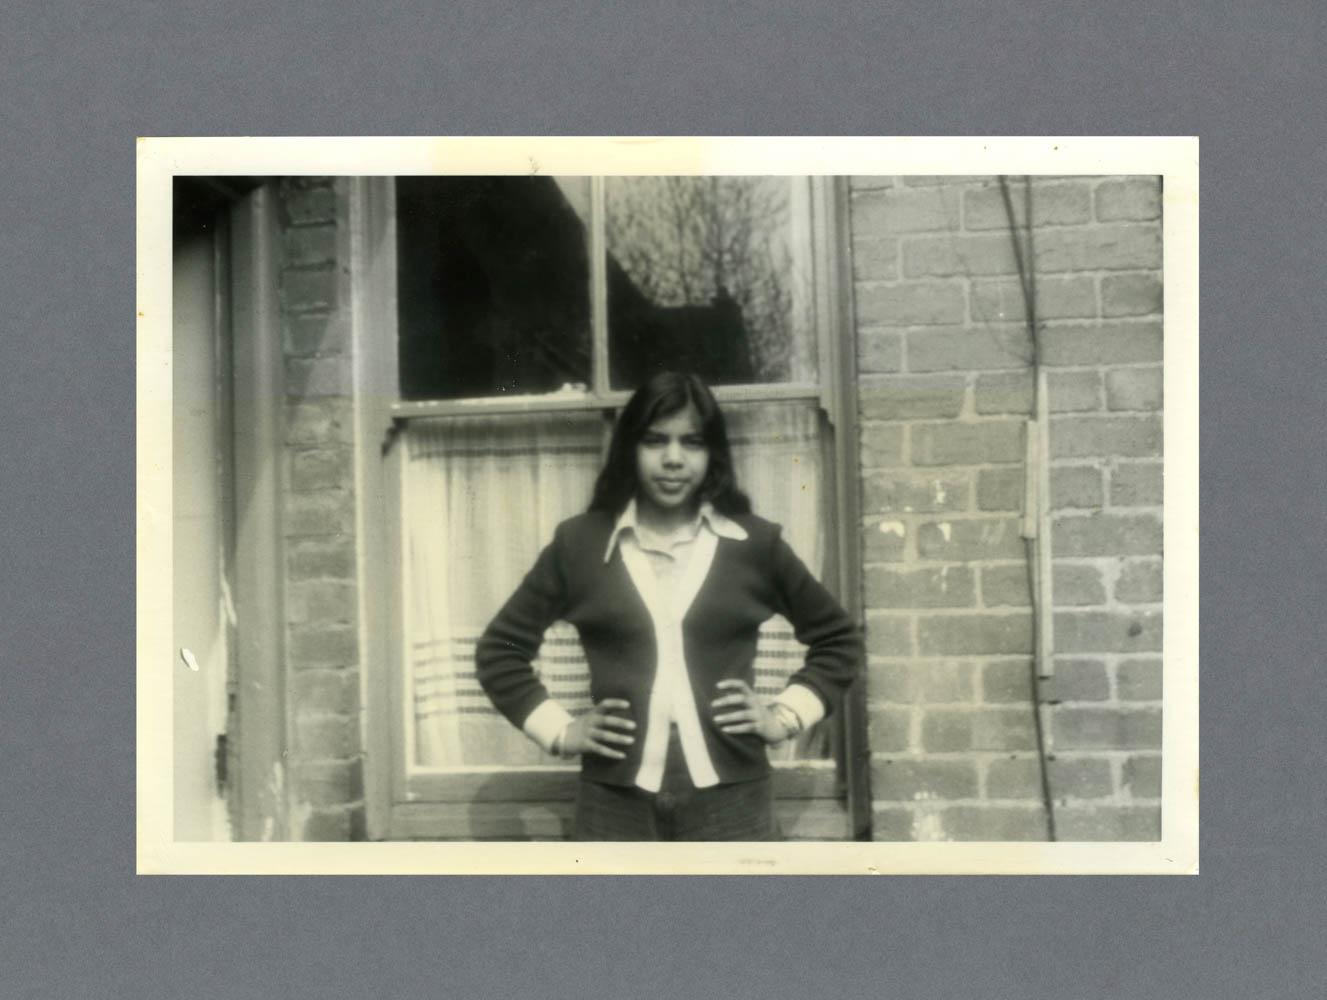 Bruford Rd. c.1979